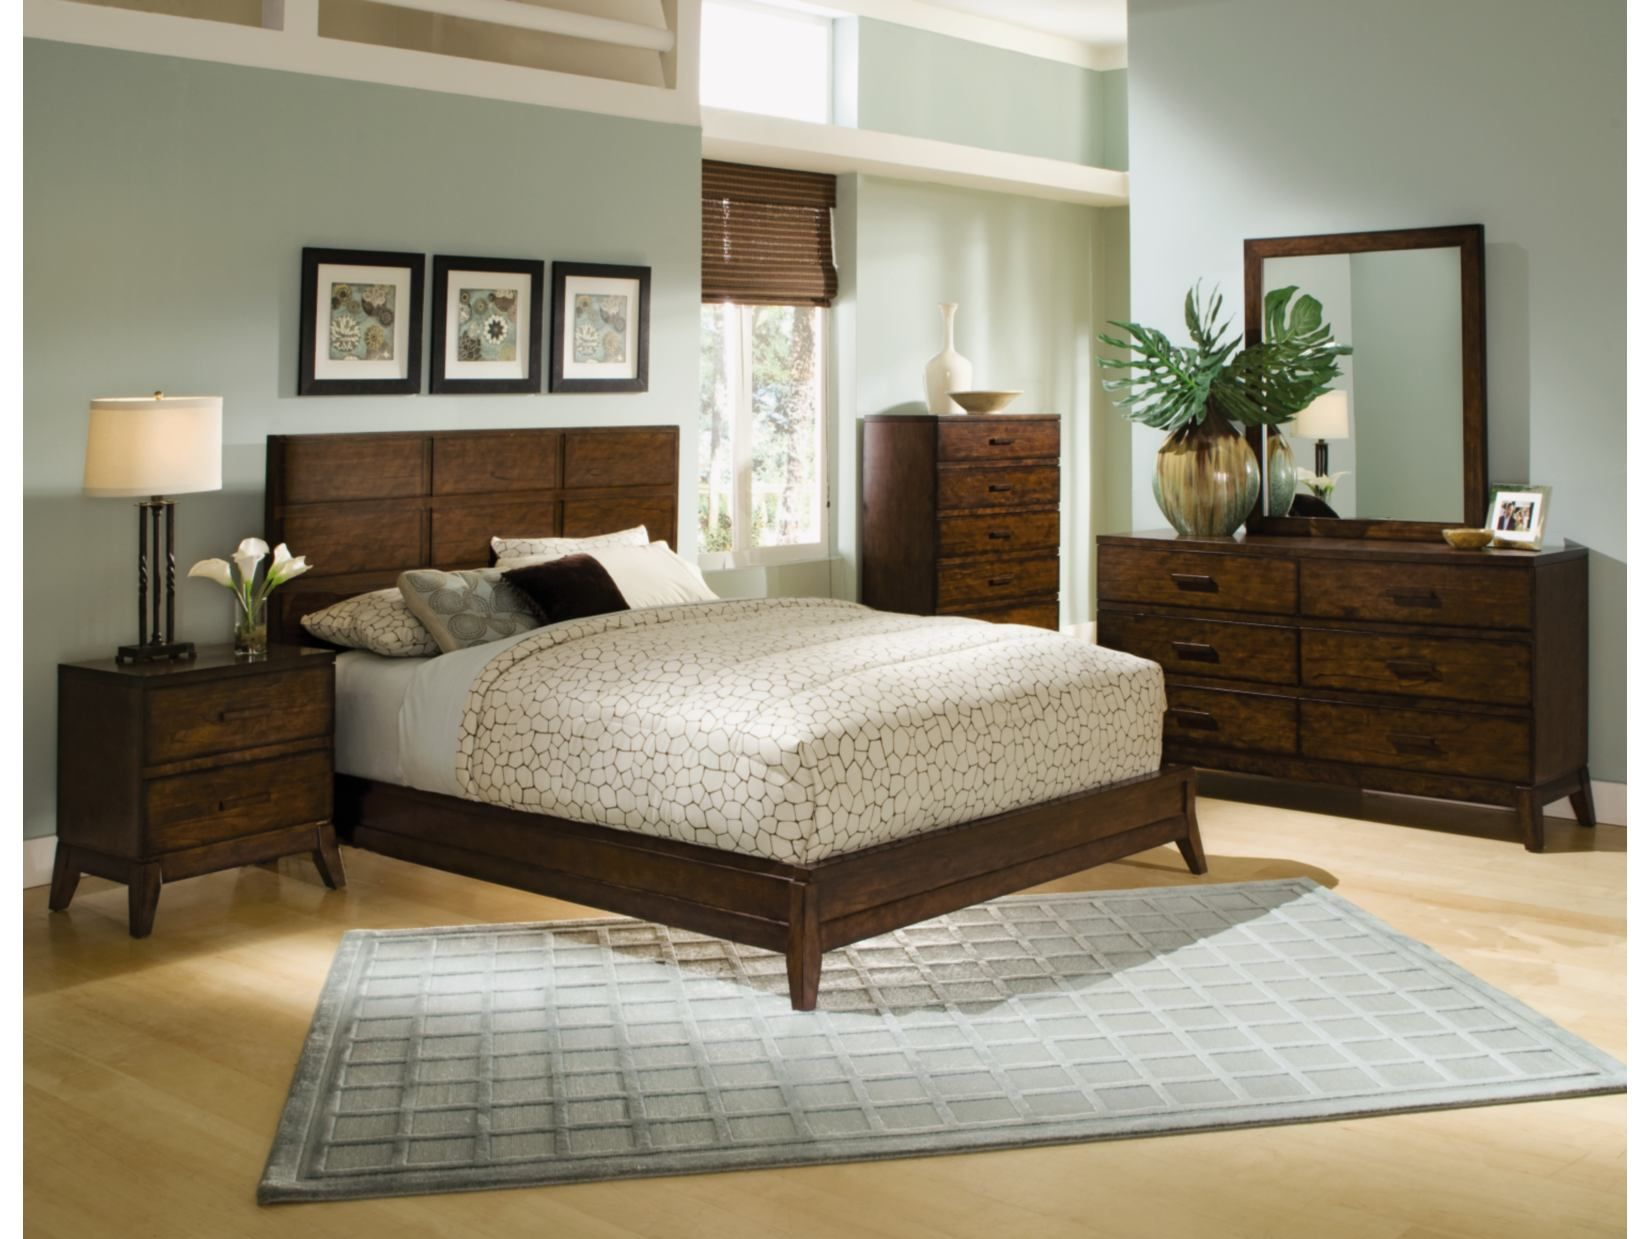 Scandia Dark 5Pc Bedroom Package  Value City Furniture  Home Impressive Value City Furniture Bedroom Sets Decorating Design